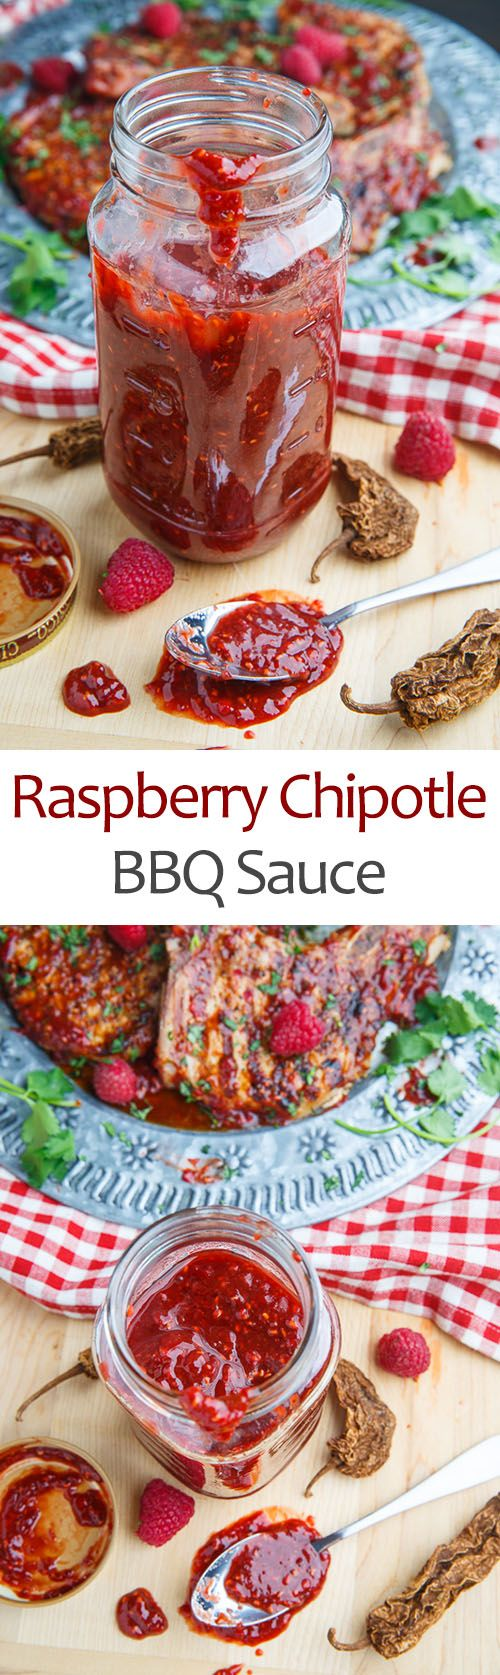 Raspberry Balsamic Chipotle BBQ Sauce